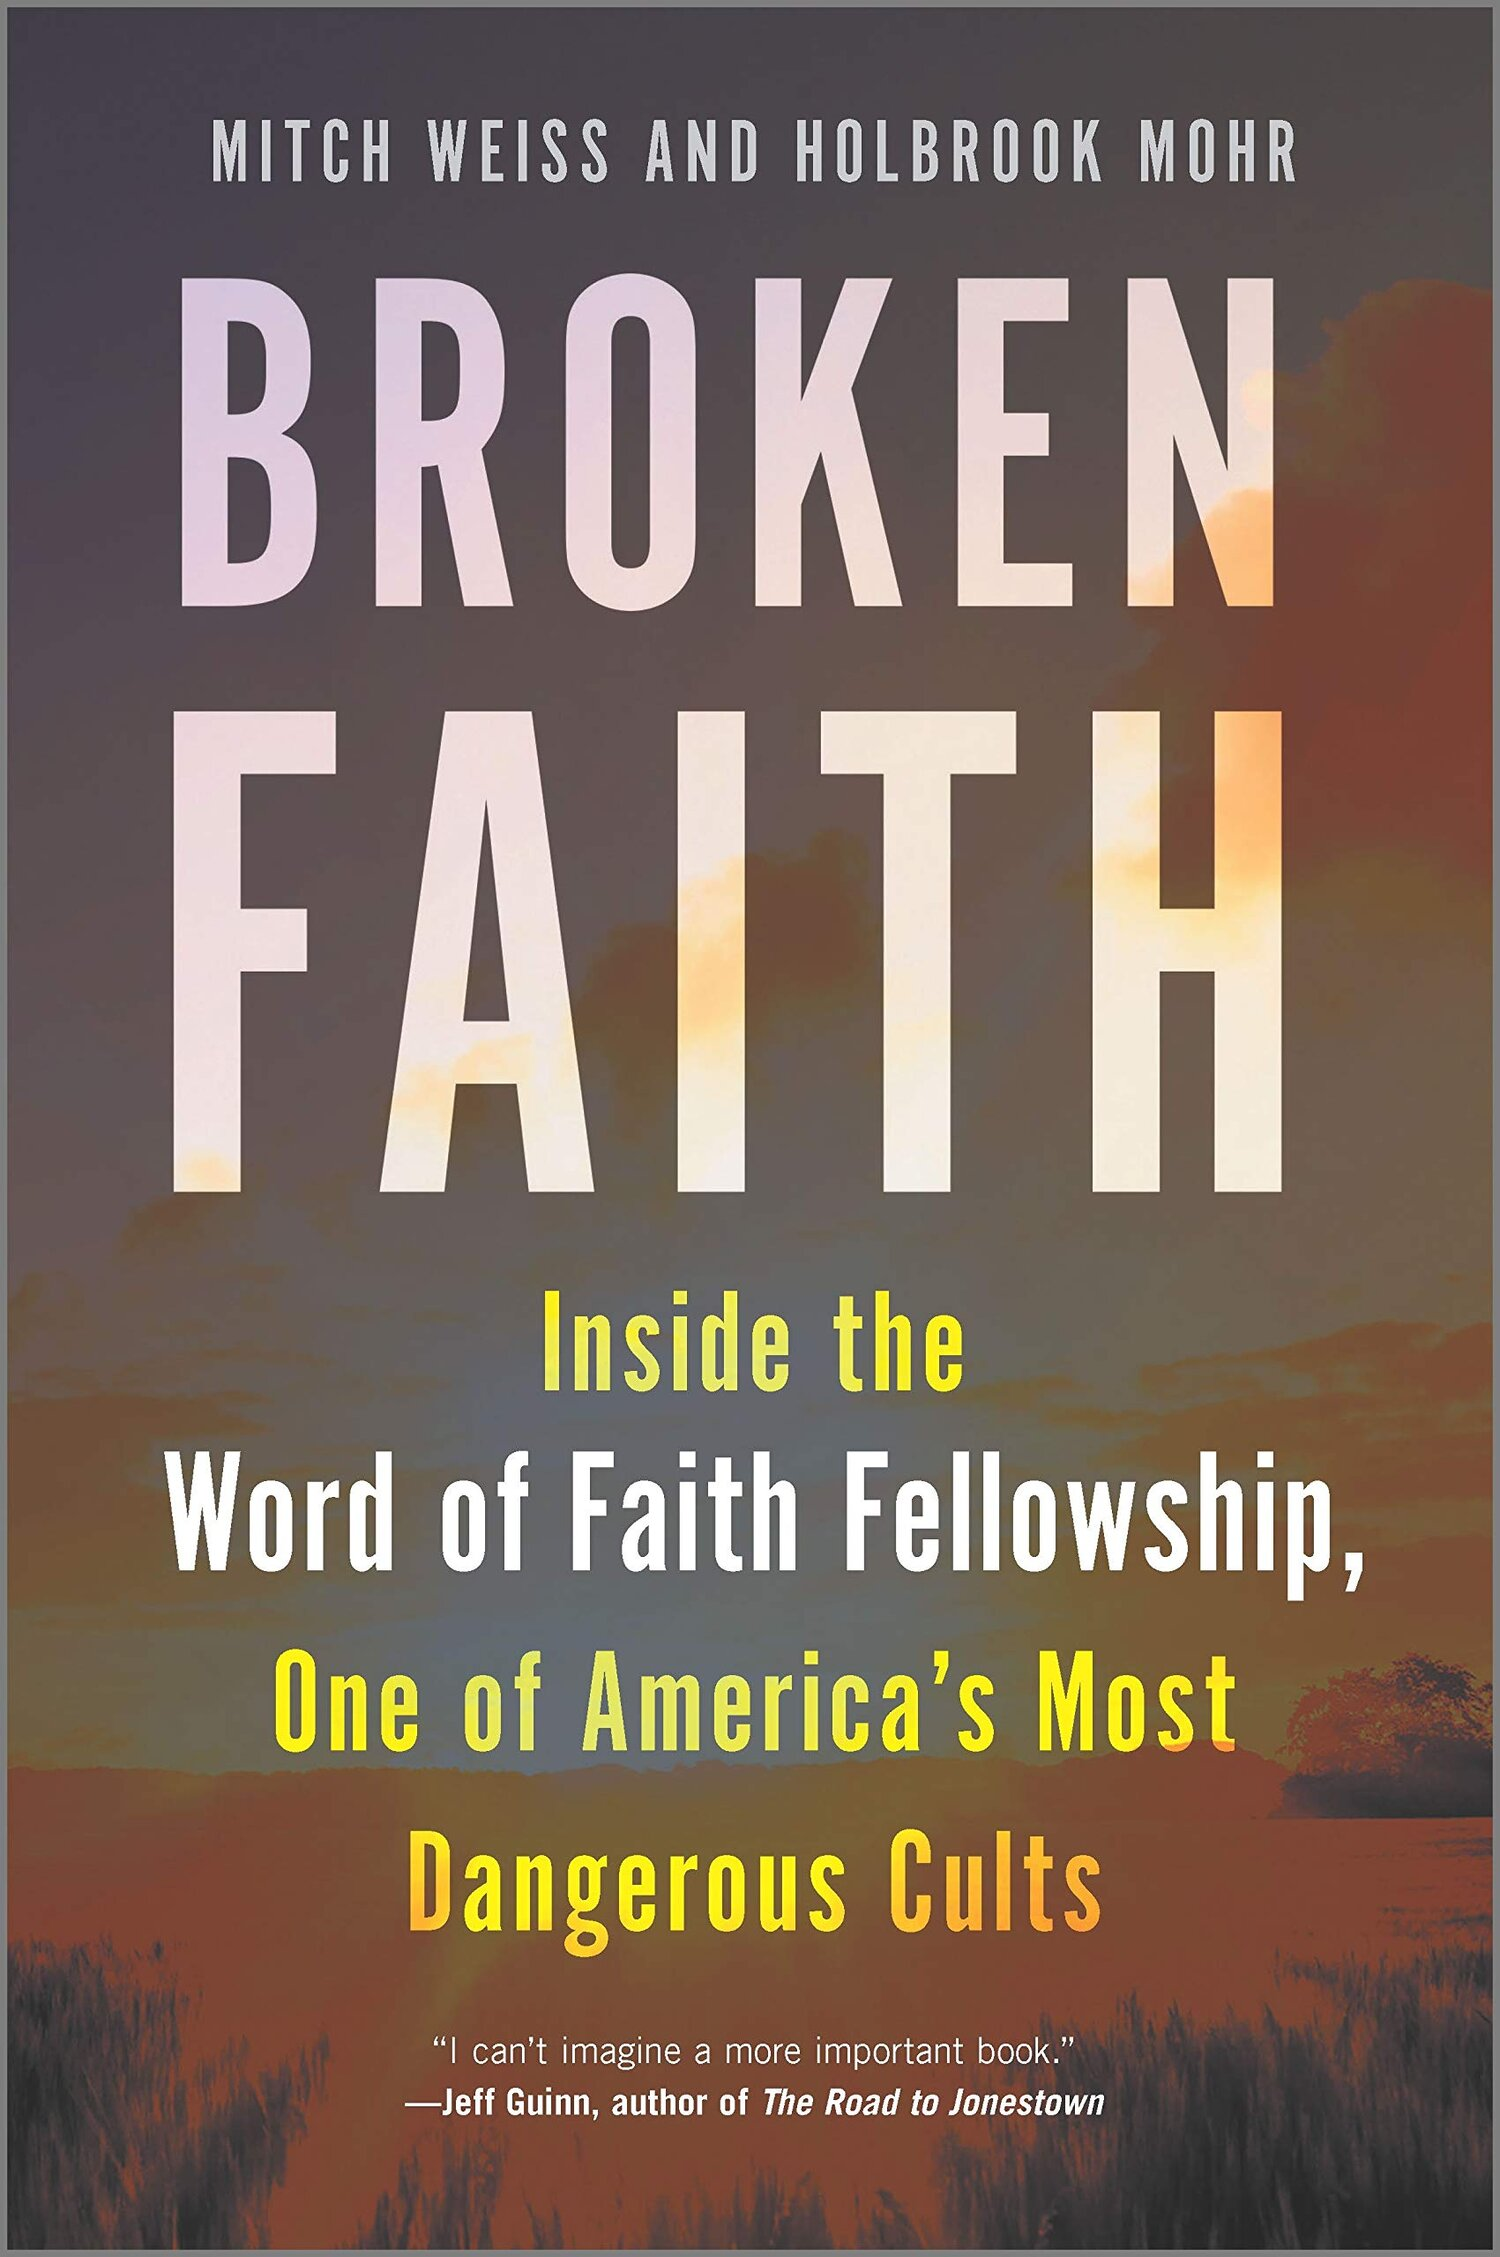 Broken Faith: Inside the Word of Faith Fellowship, America's Most Dangerous Cult — Midtown Scholar Bookstore-Cafe